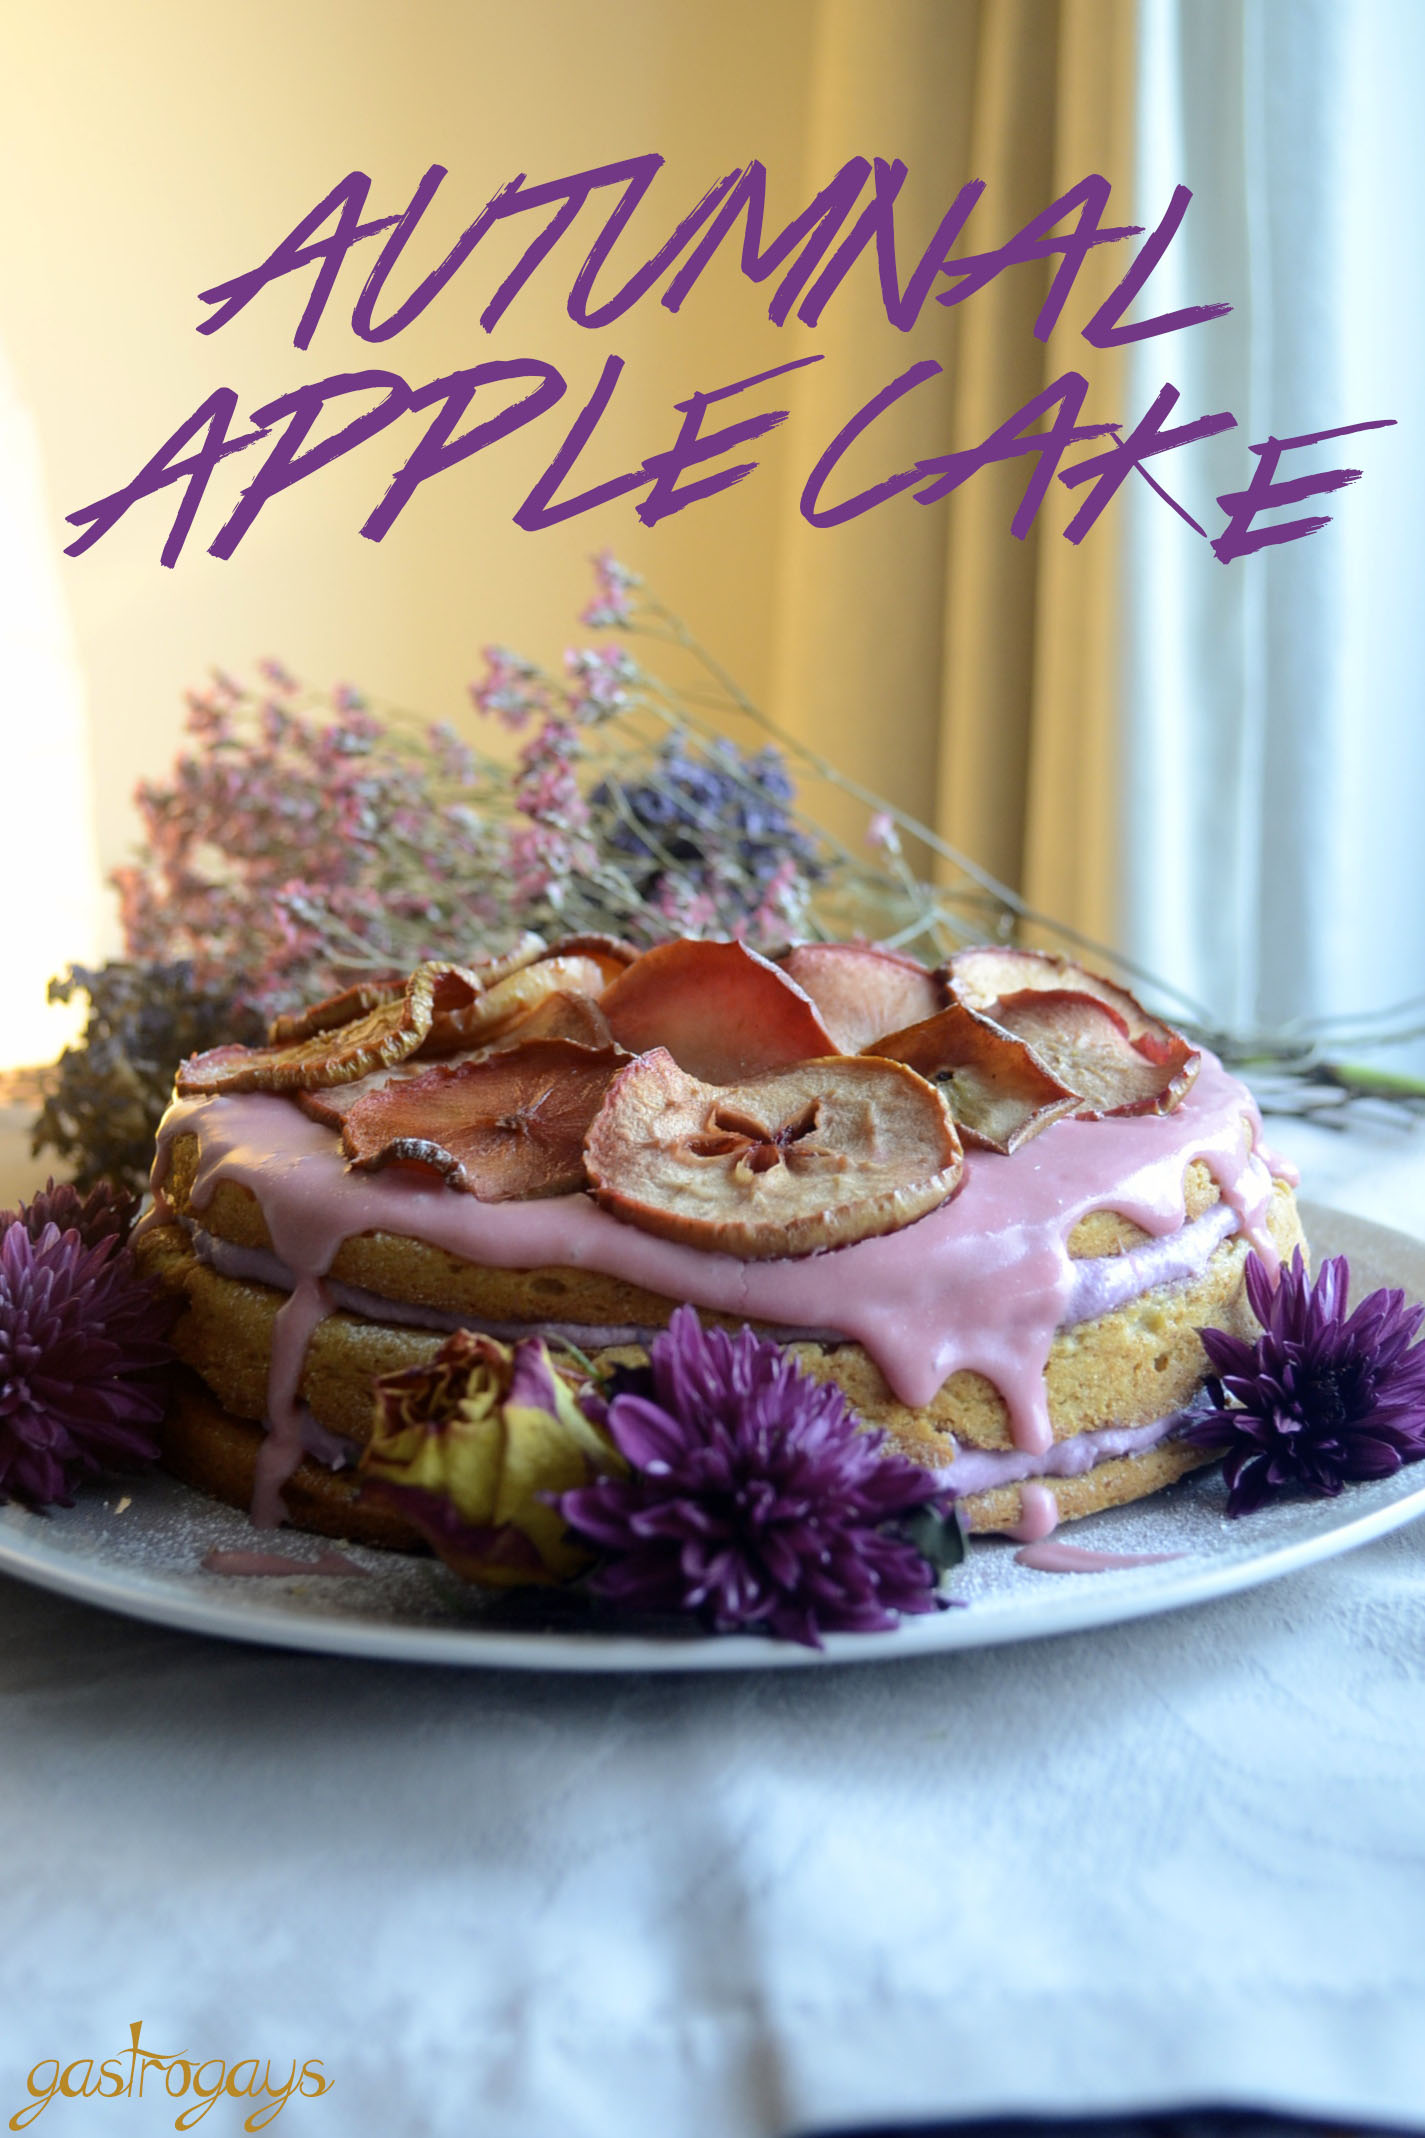 autumnal apple cake, floral cake, apple slice cake, apple cake, pink icing, purple buttercream